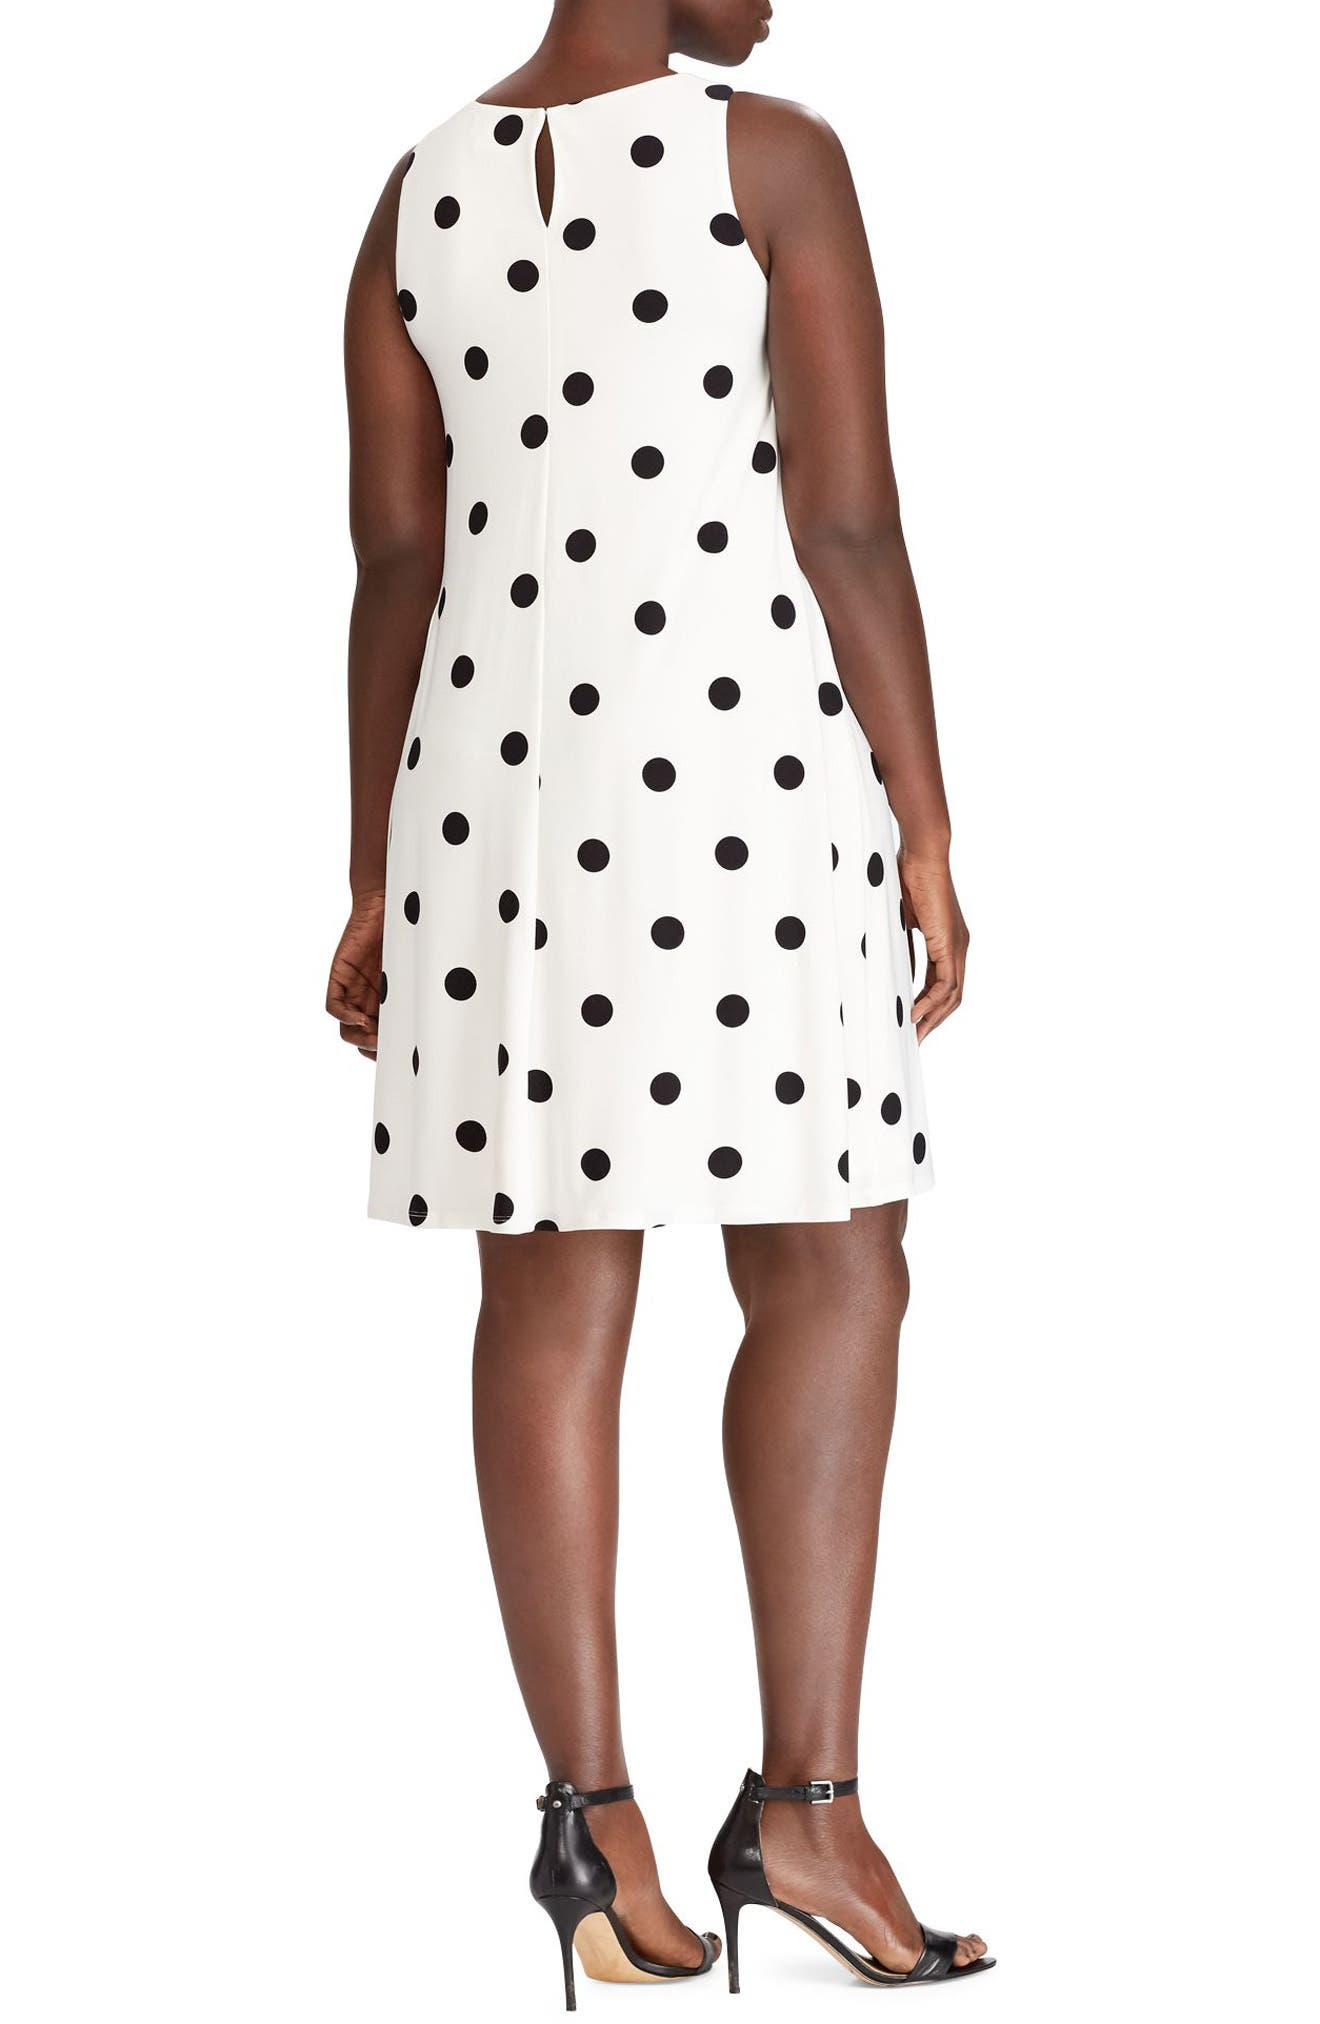 Peninsula Dot A-Line Dress,                             Alternate thumbnail 2, color,                             Col. Cream-Black